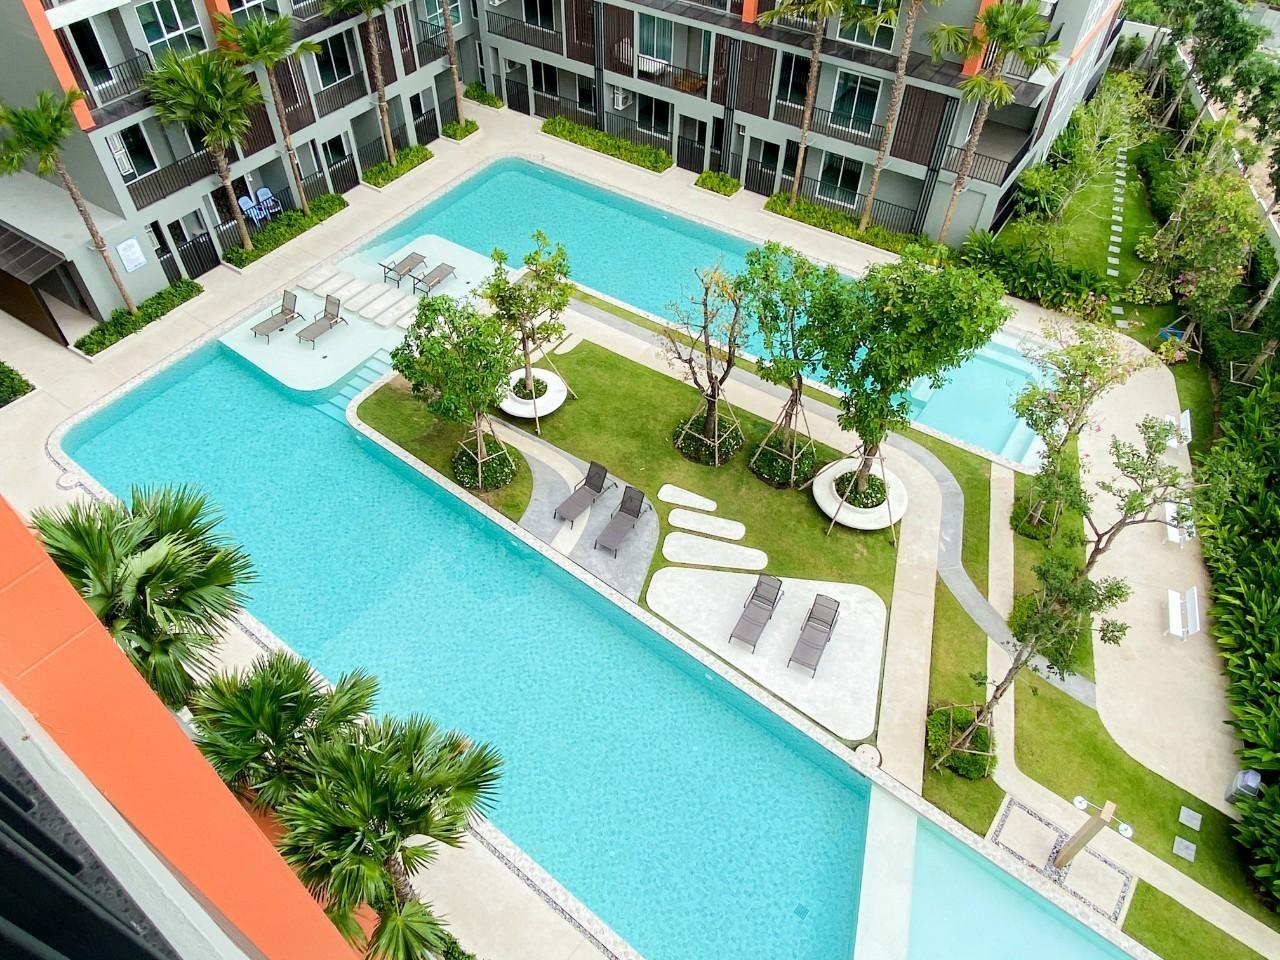 Hua Hin Apartment Condo for Sale in the heart of Hua Hin